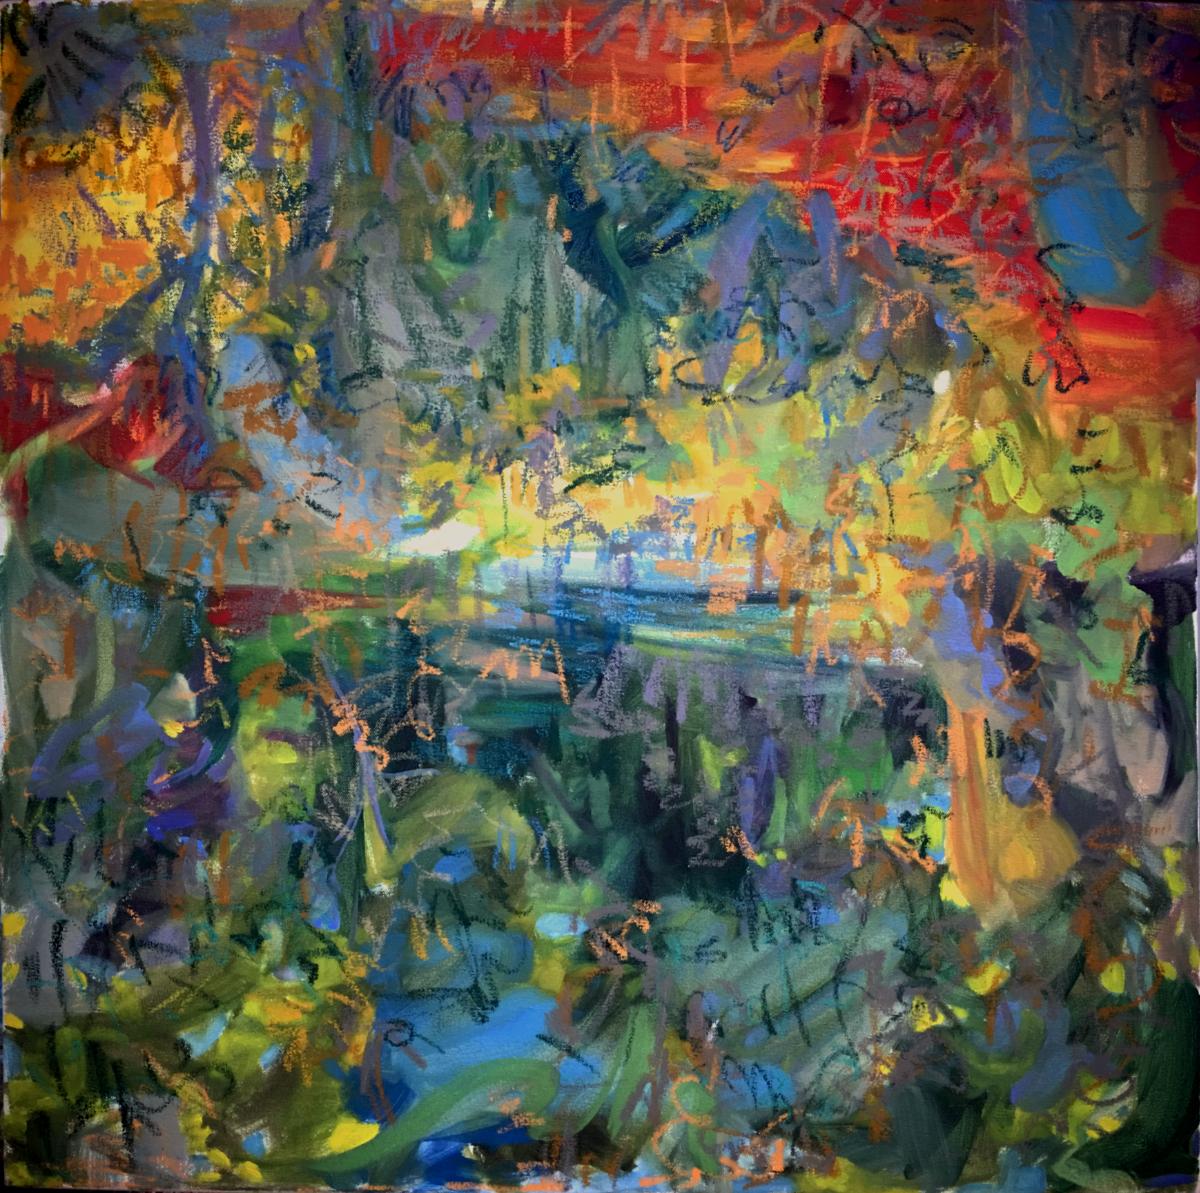 Gravity Escapement XXX; Oil on Canvas 30x30 inches 2016